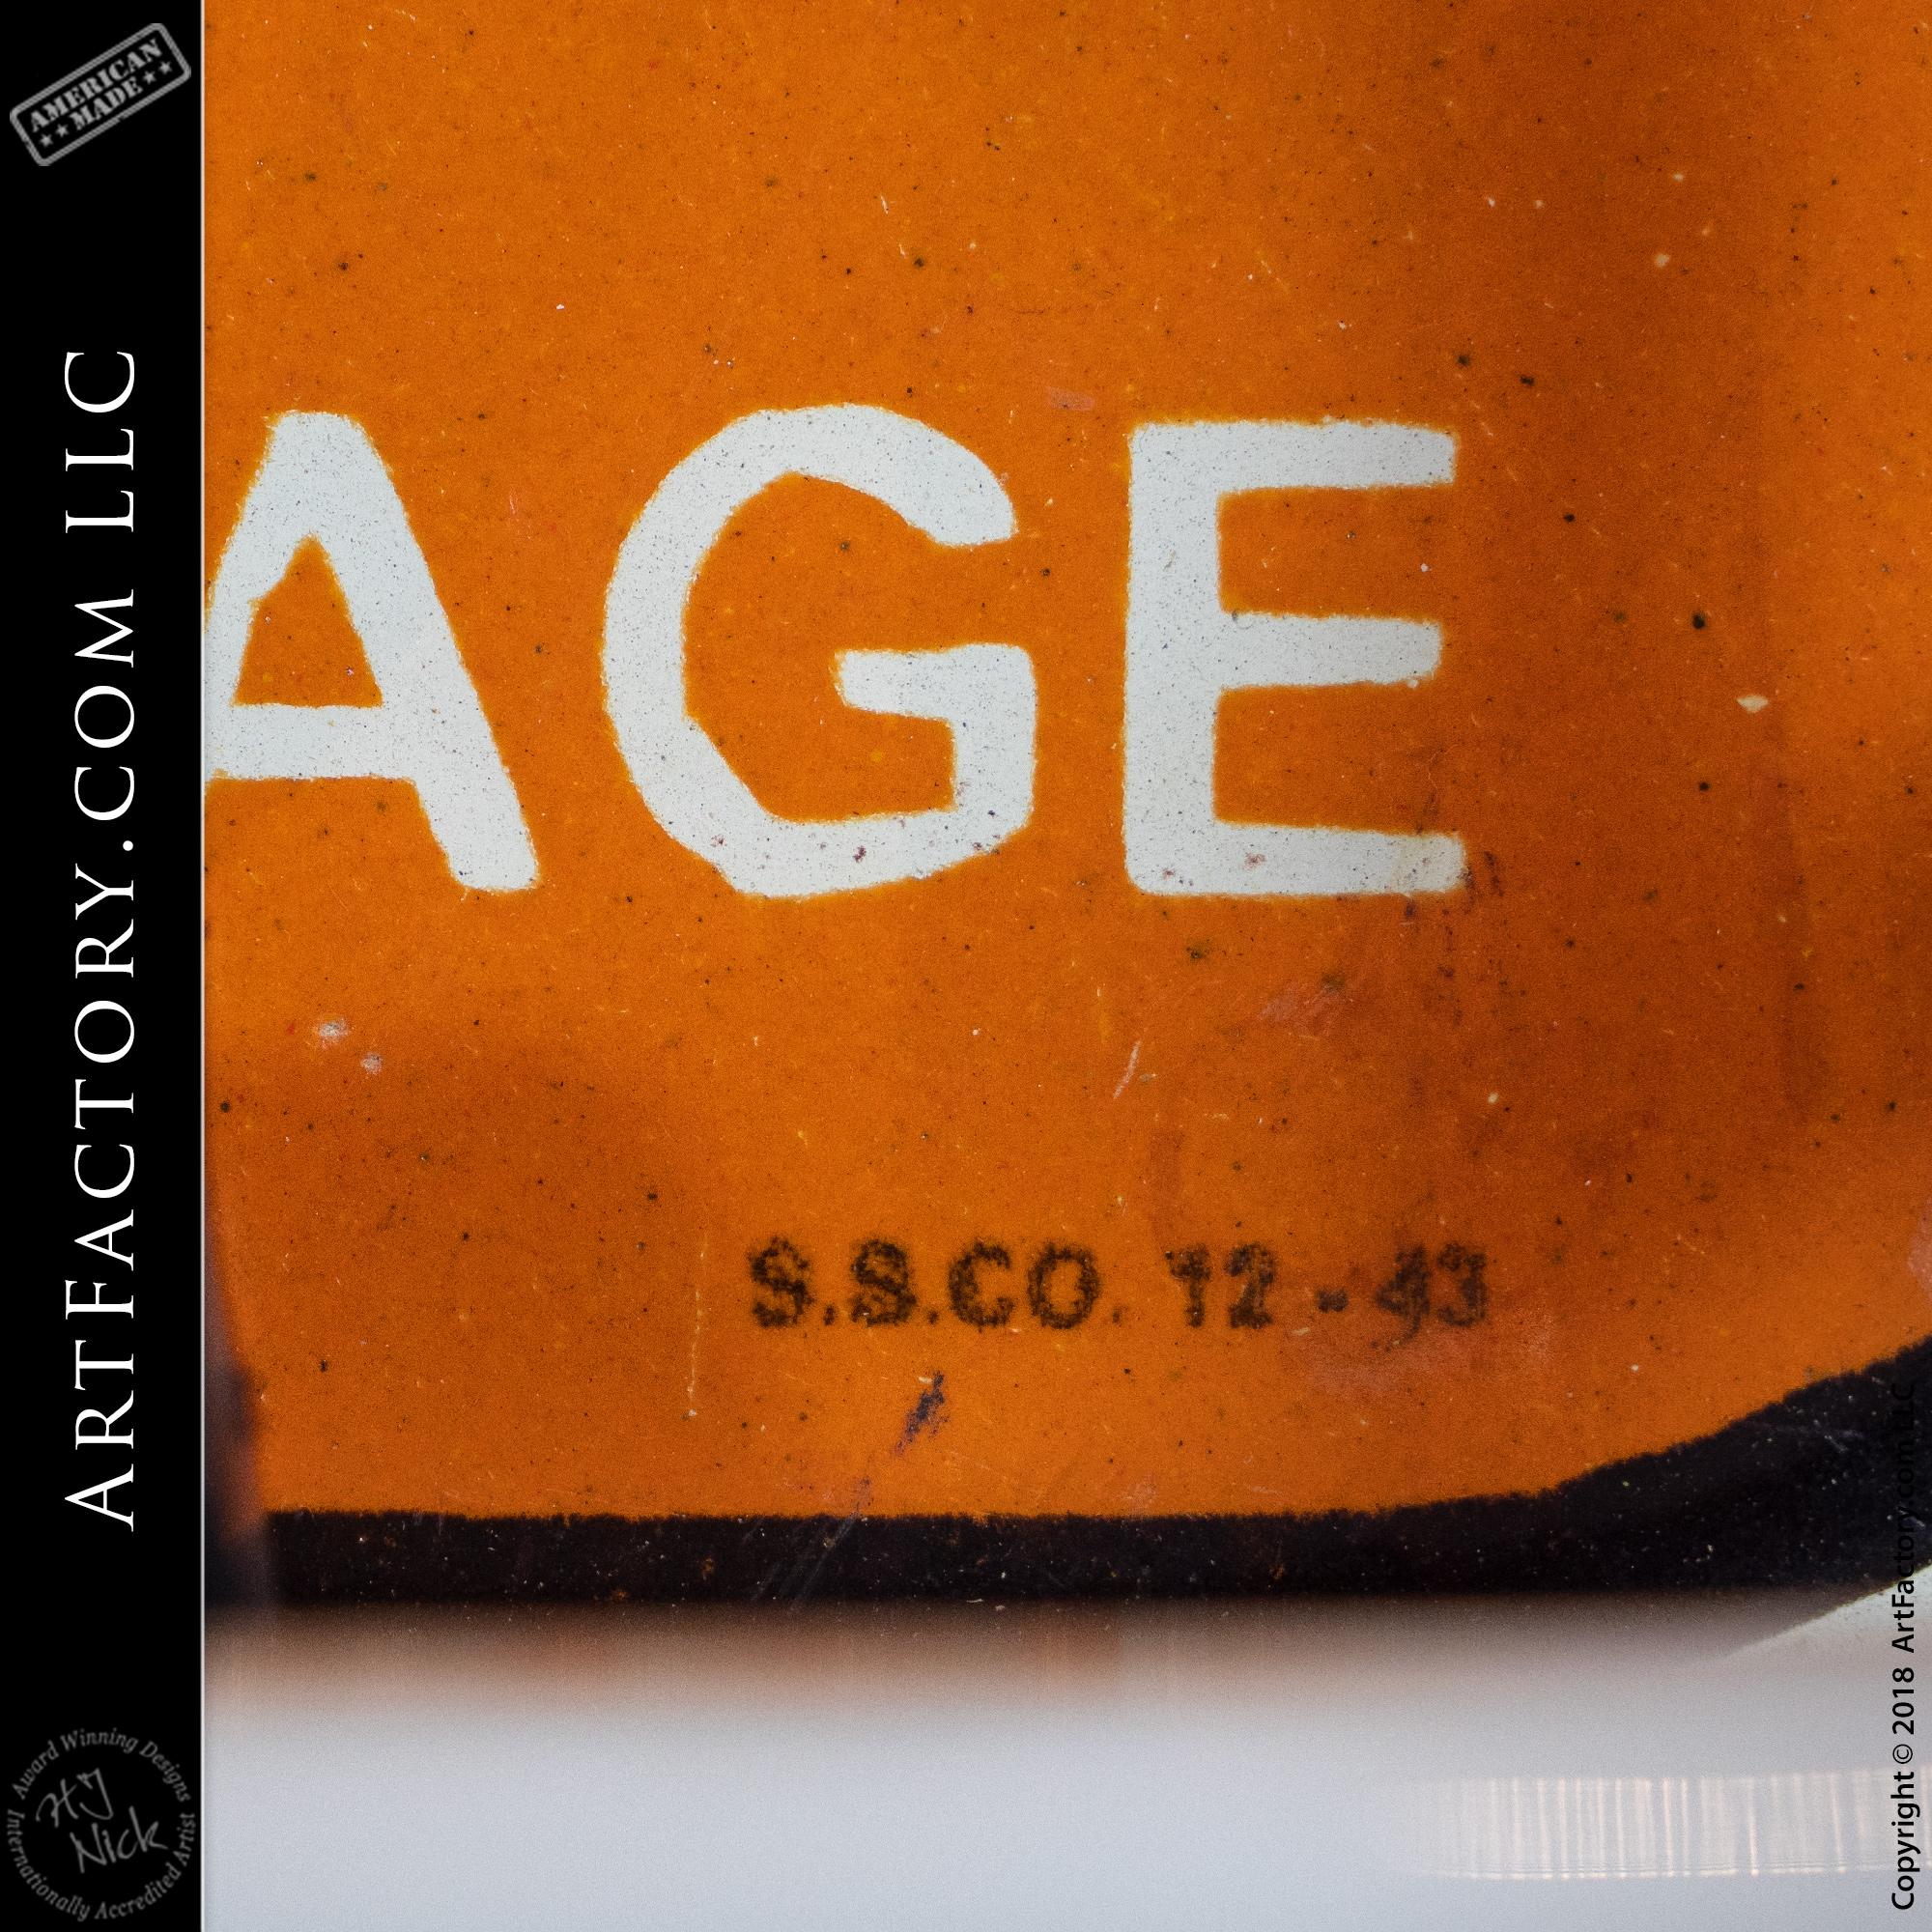 Vintage Orange Crush Neon Sign